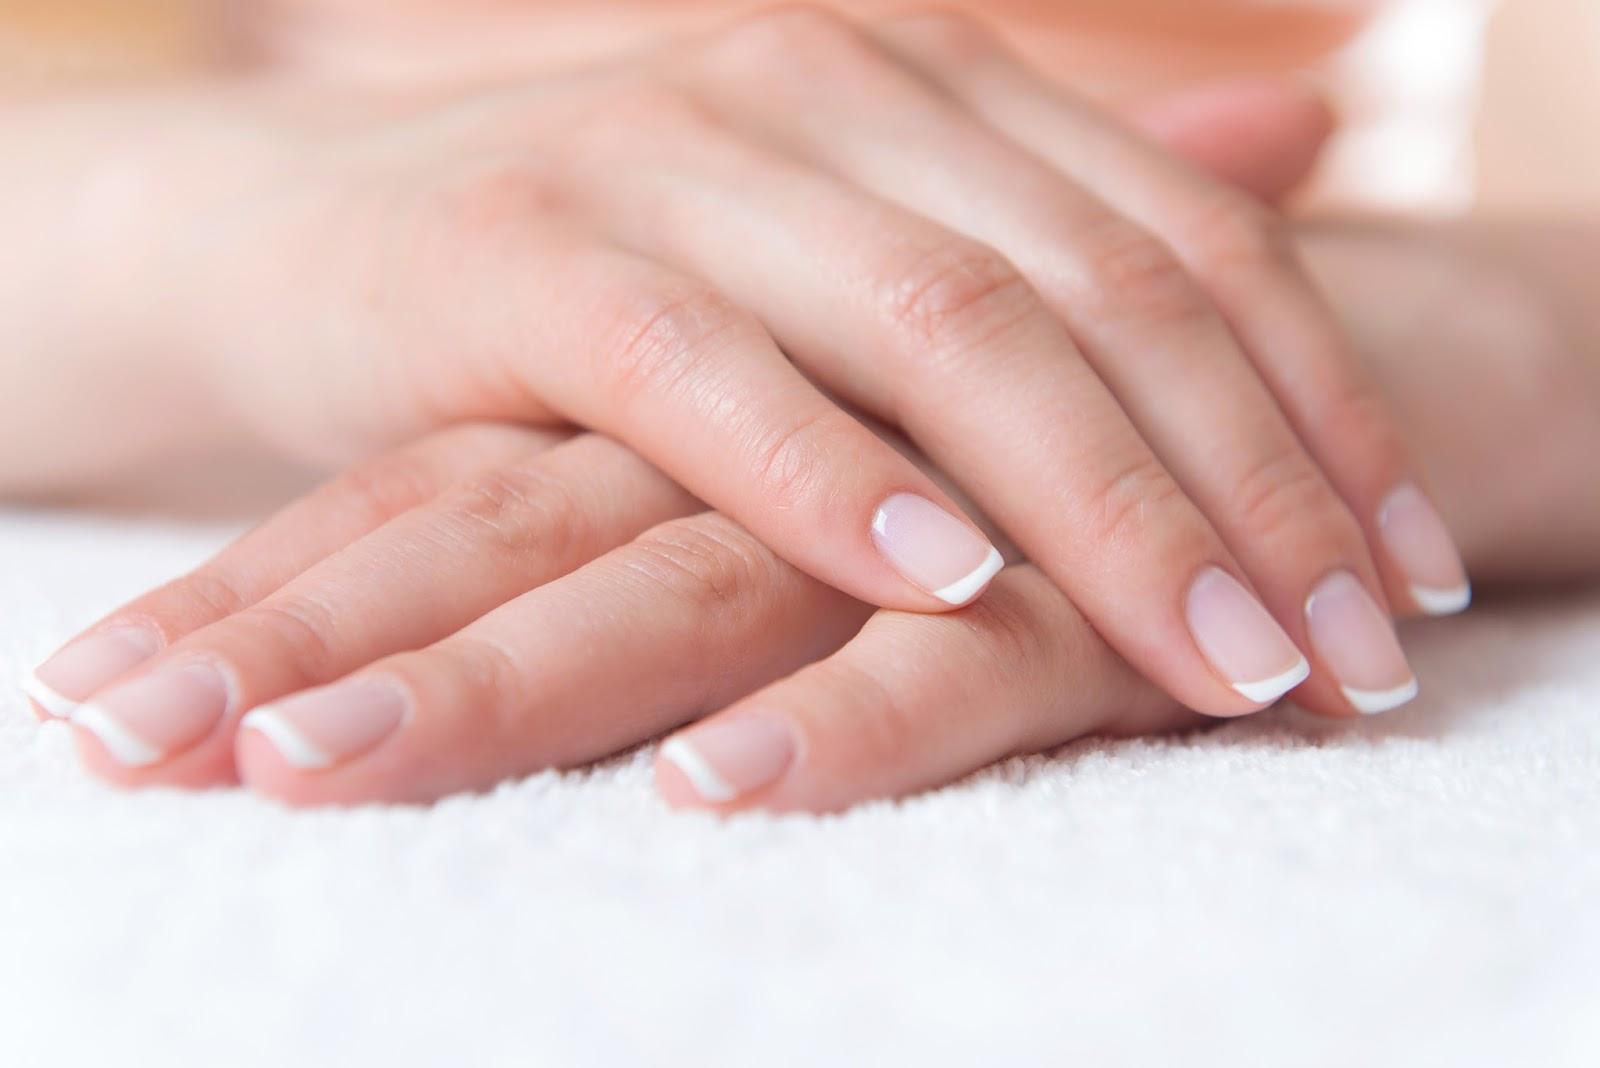 Magic Nails Specialista Na Nehty Gelove Akrylove I Prirodni Atraktivni Vzhled Nehtu